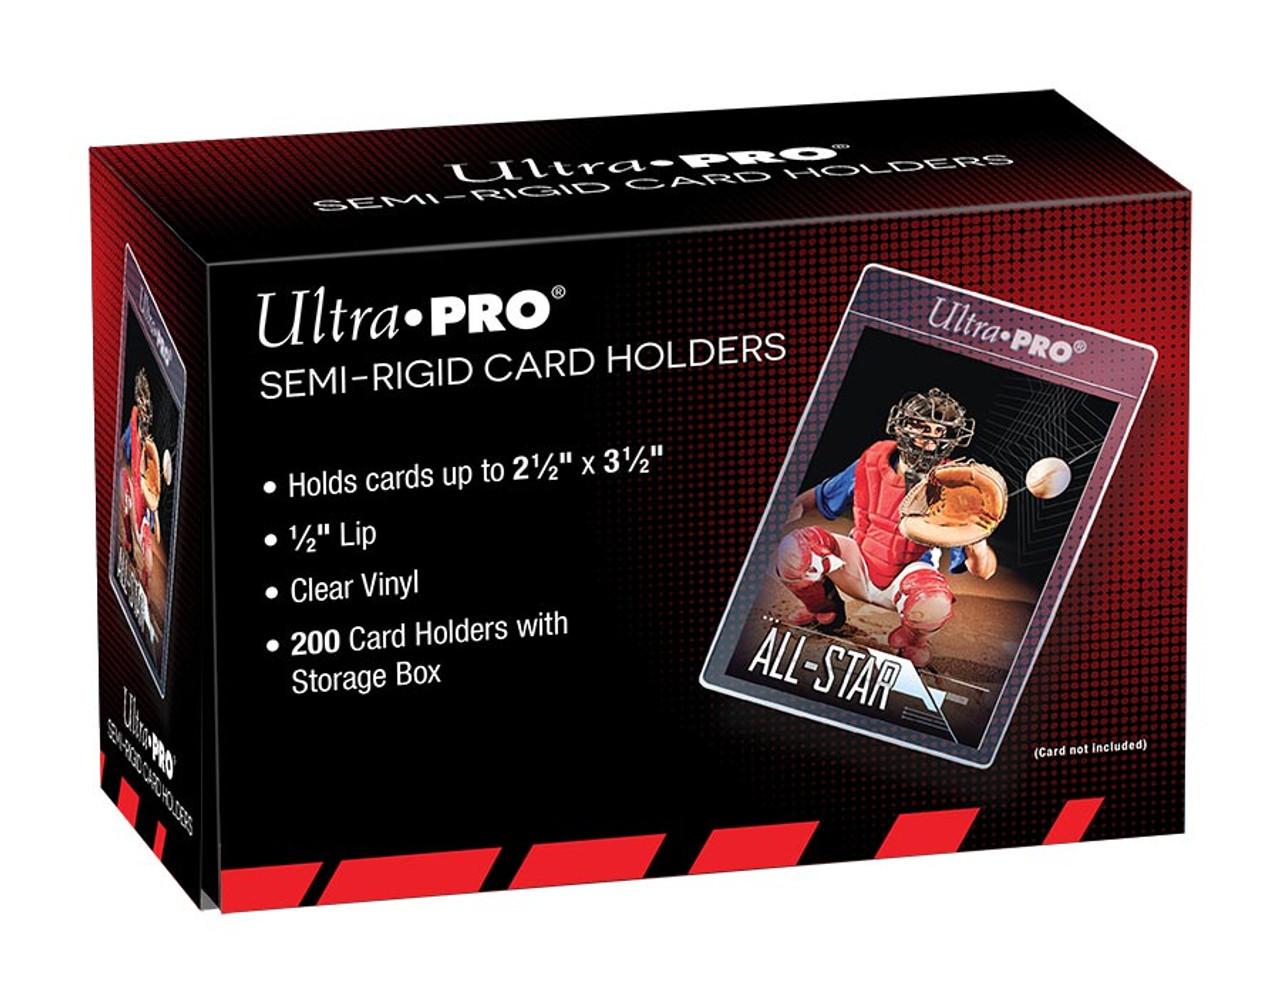 Semi-Rigid Card Holders (200 per box)